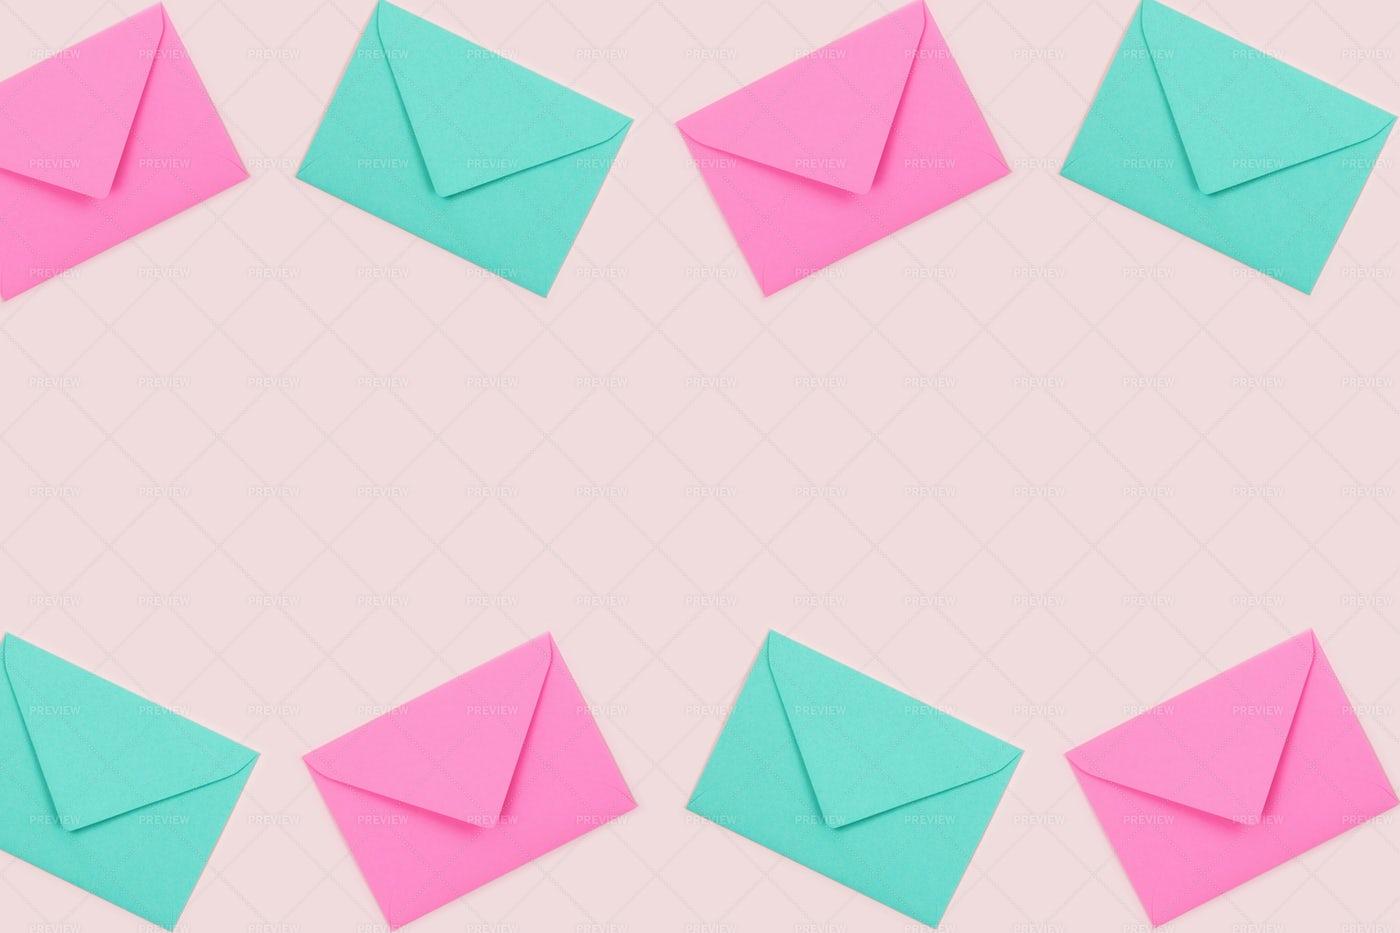 Colorful Envelopes: Stock Photos